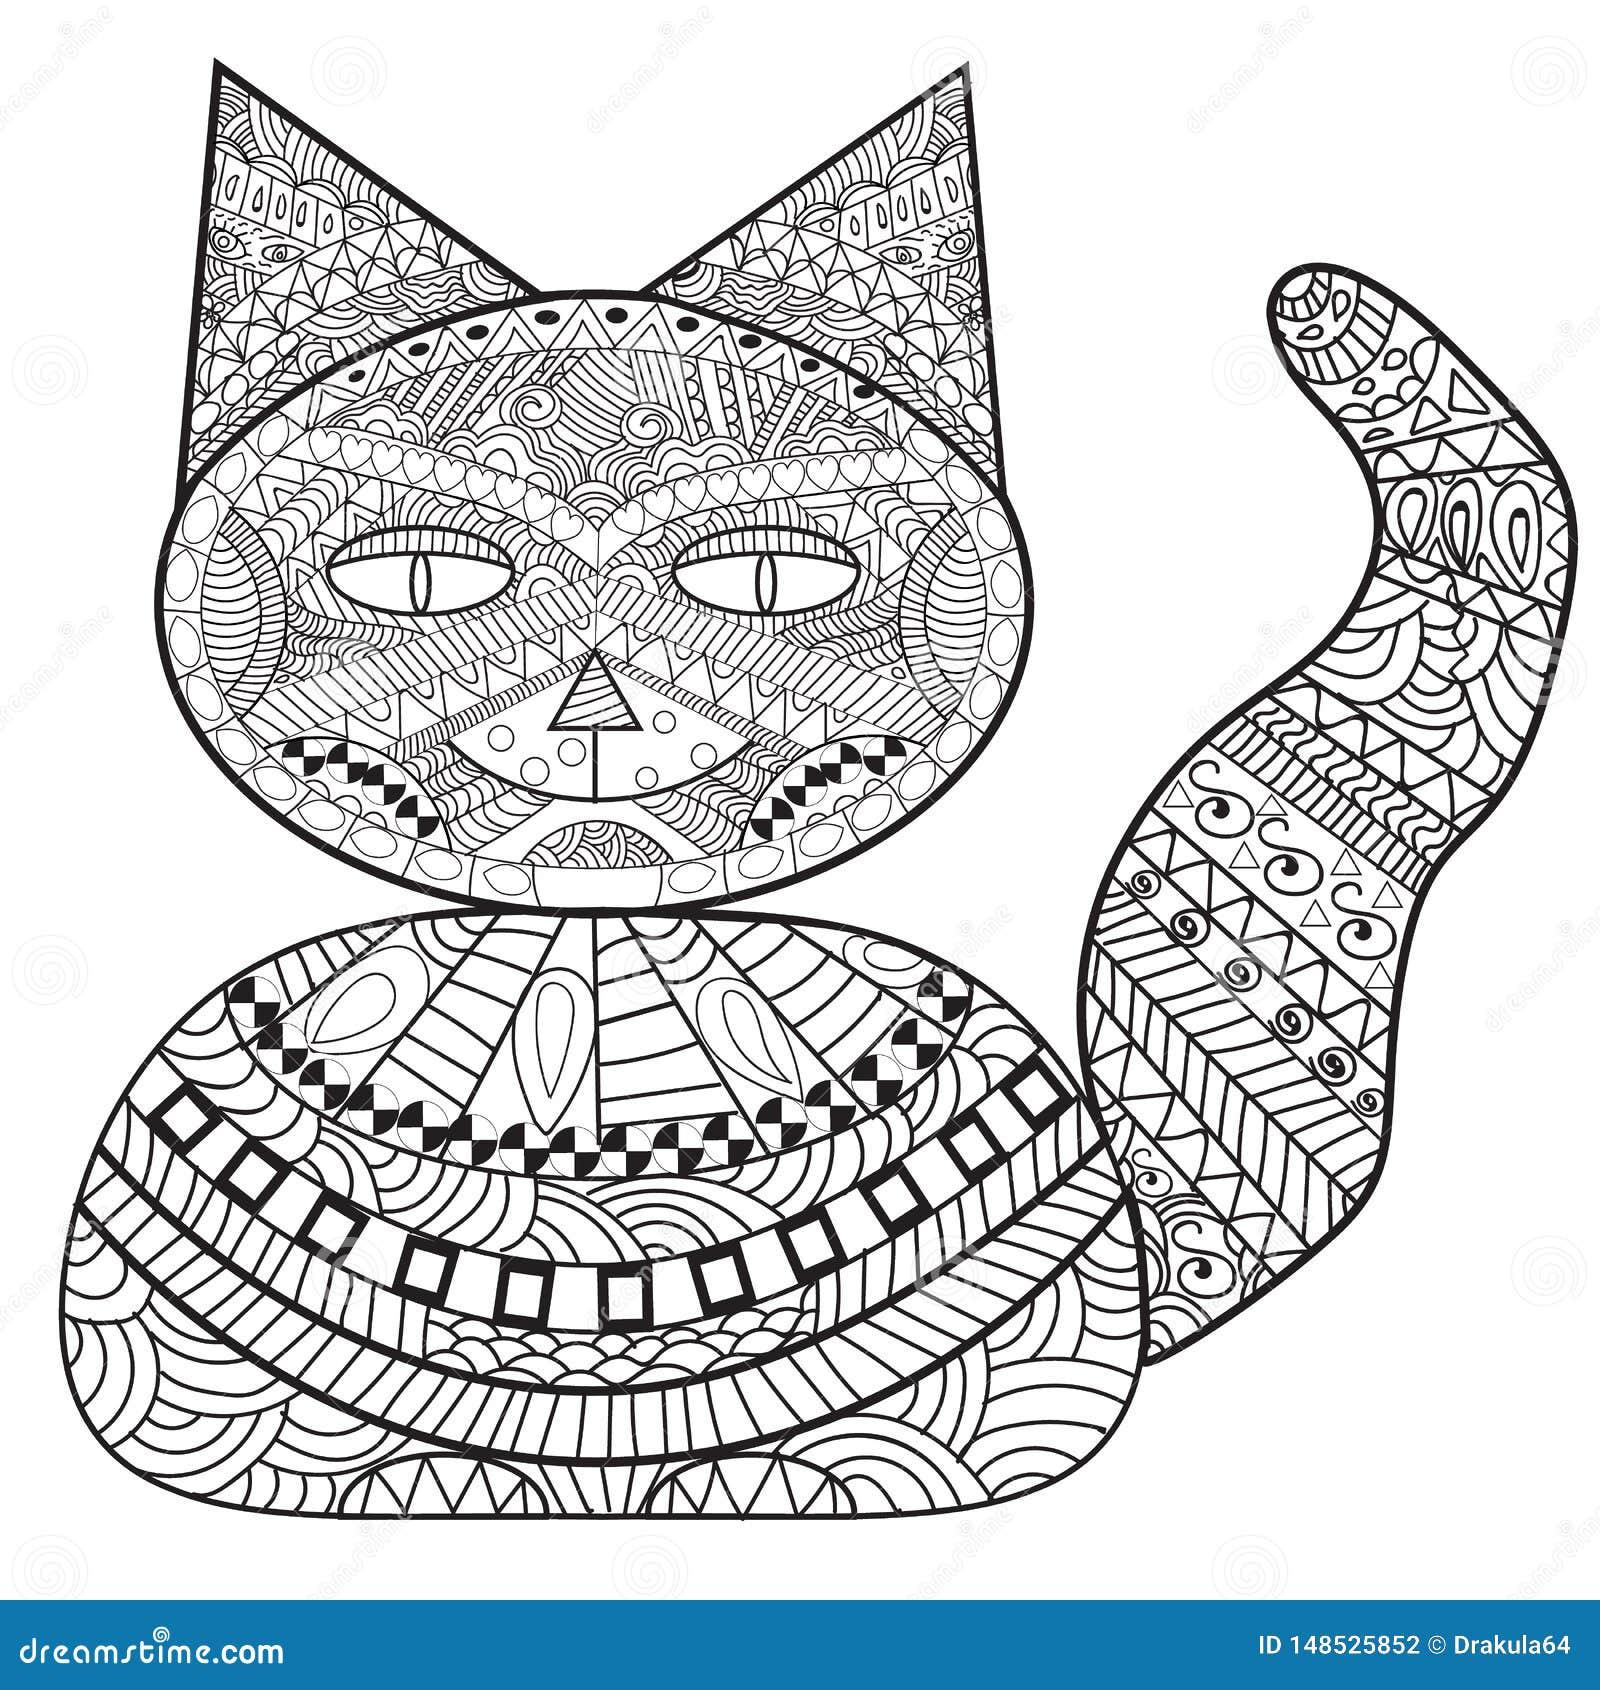 Zentangle cat bank, decoration cat, adult coloring book, coloring